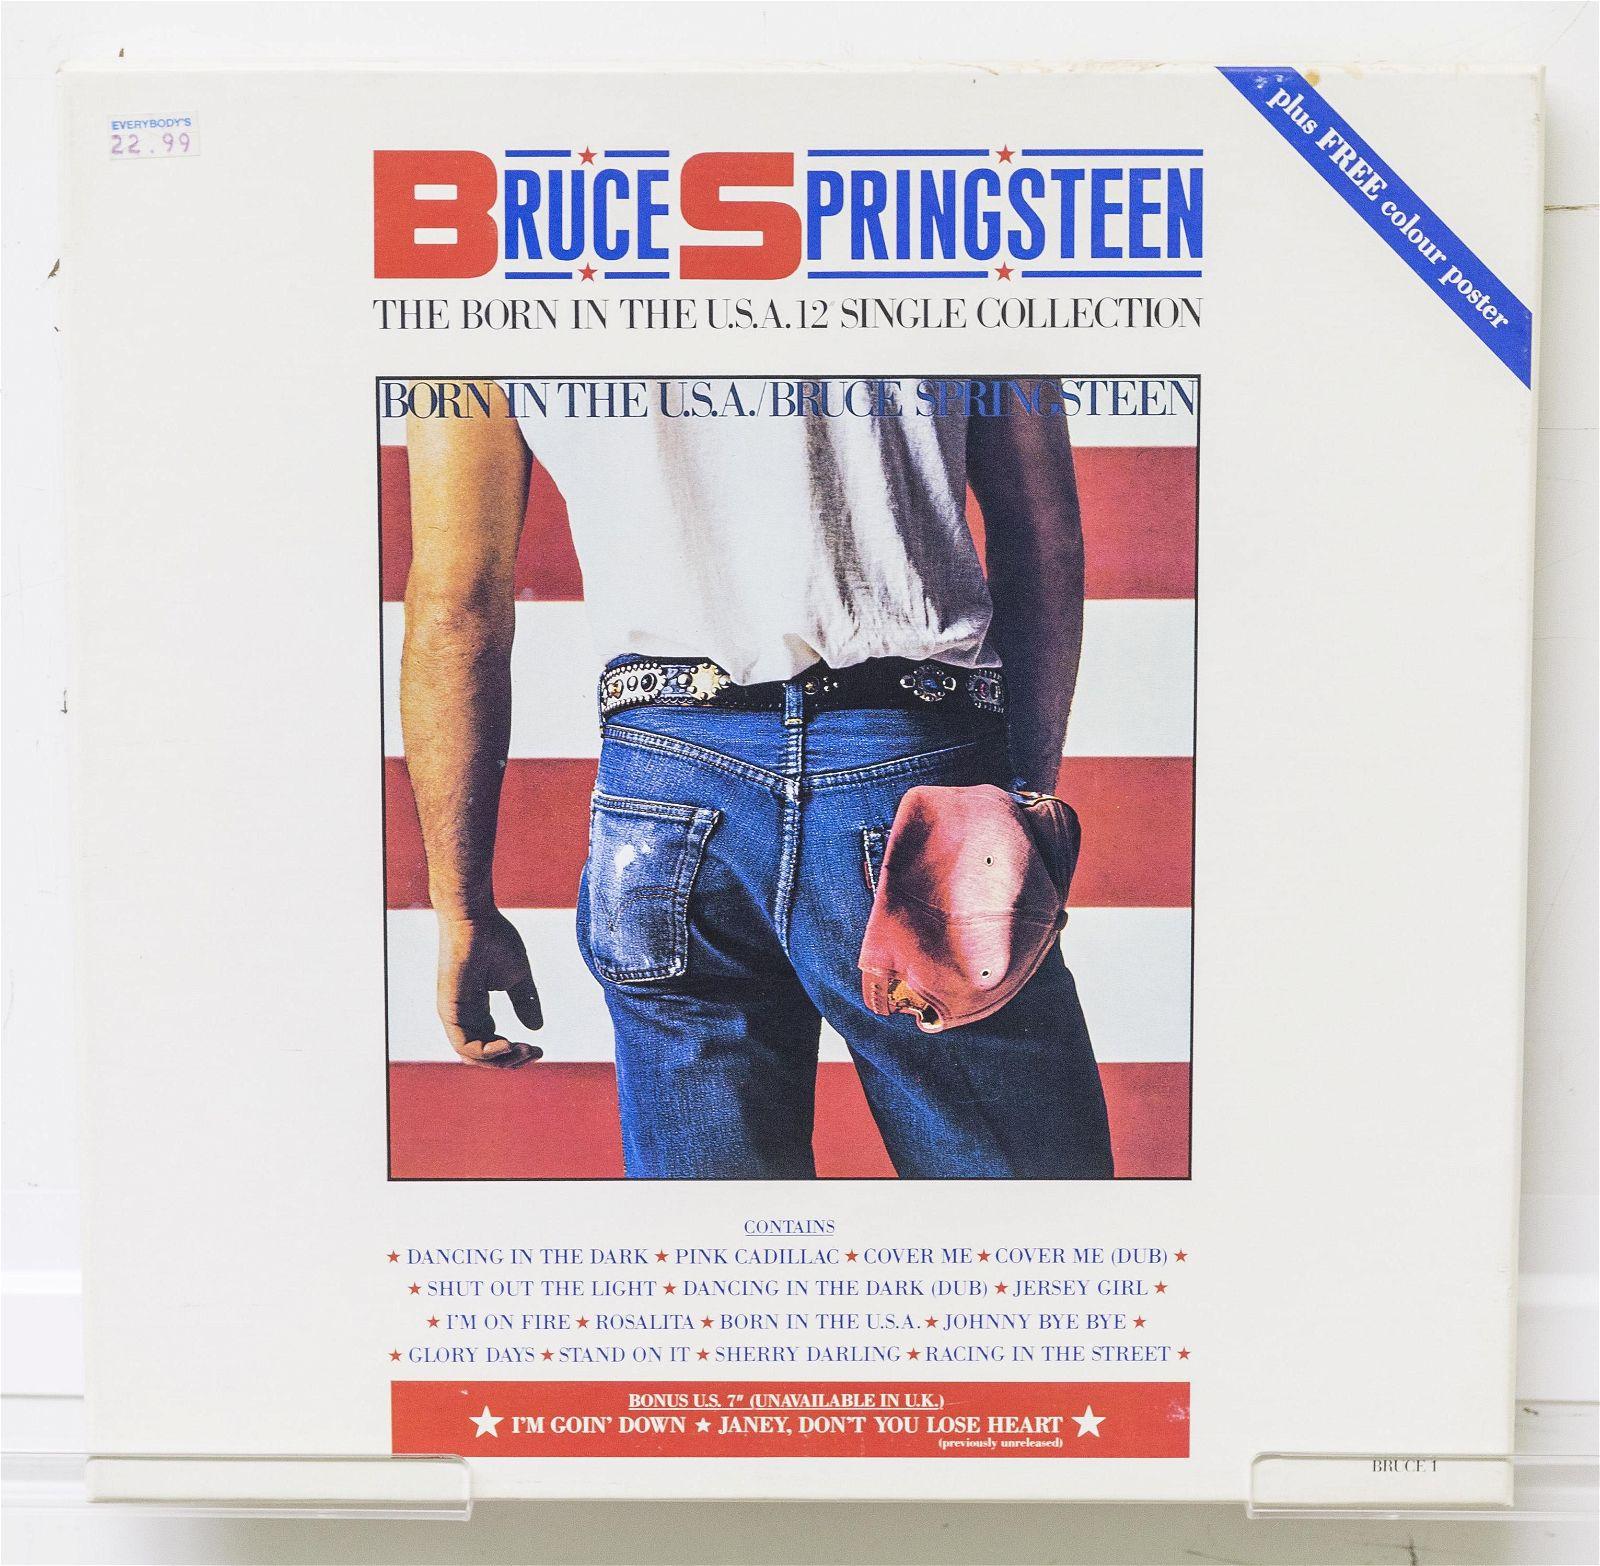 Bruce Springsteen 4 Record Box Set